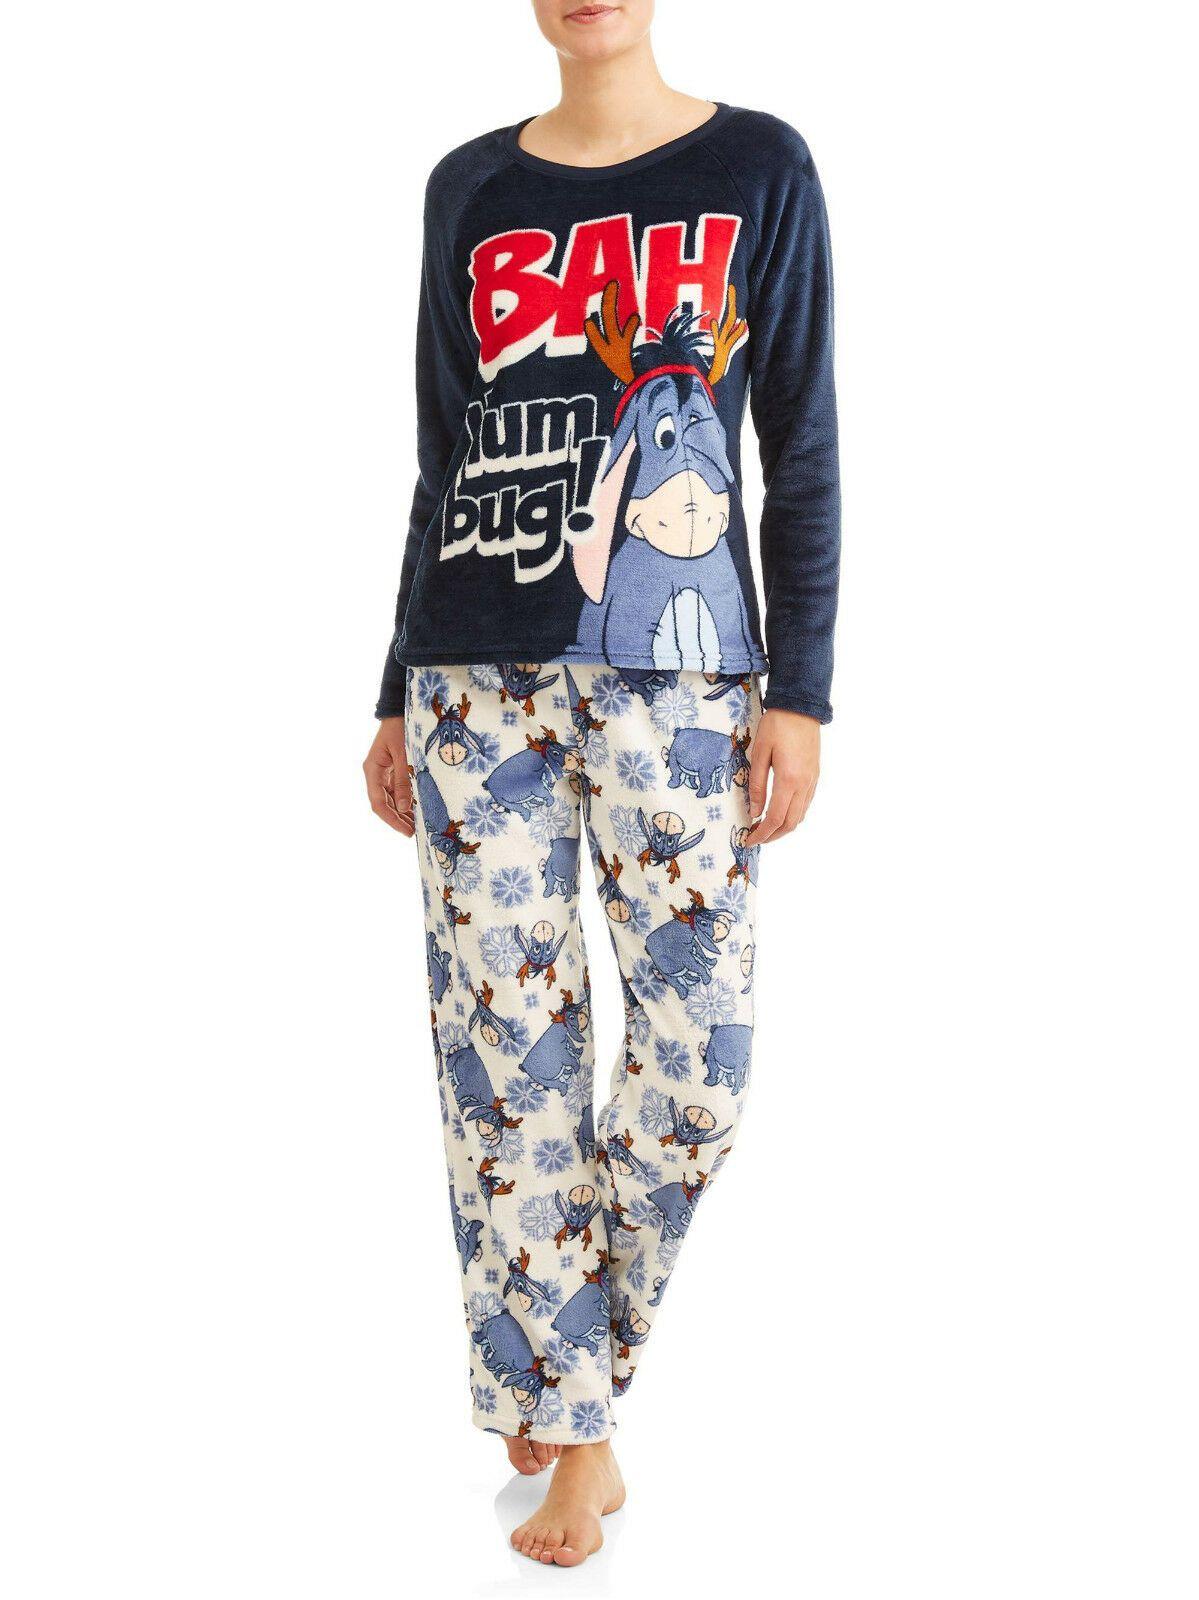 Details about 2Pc EEYORE Soft Plush Pajama Set Top